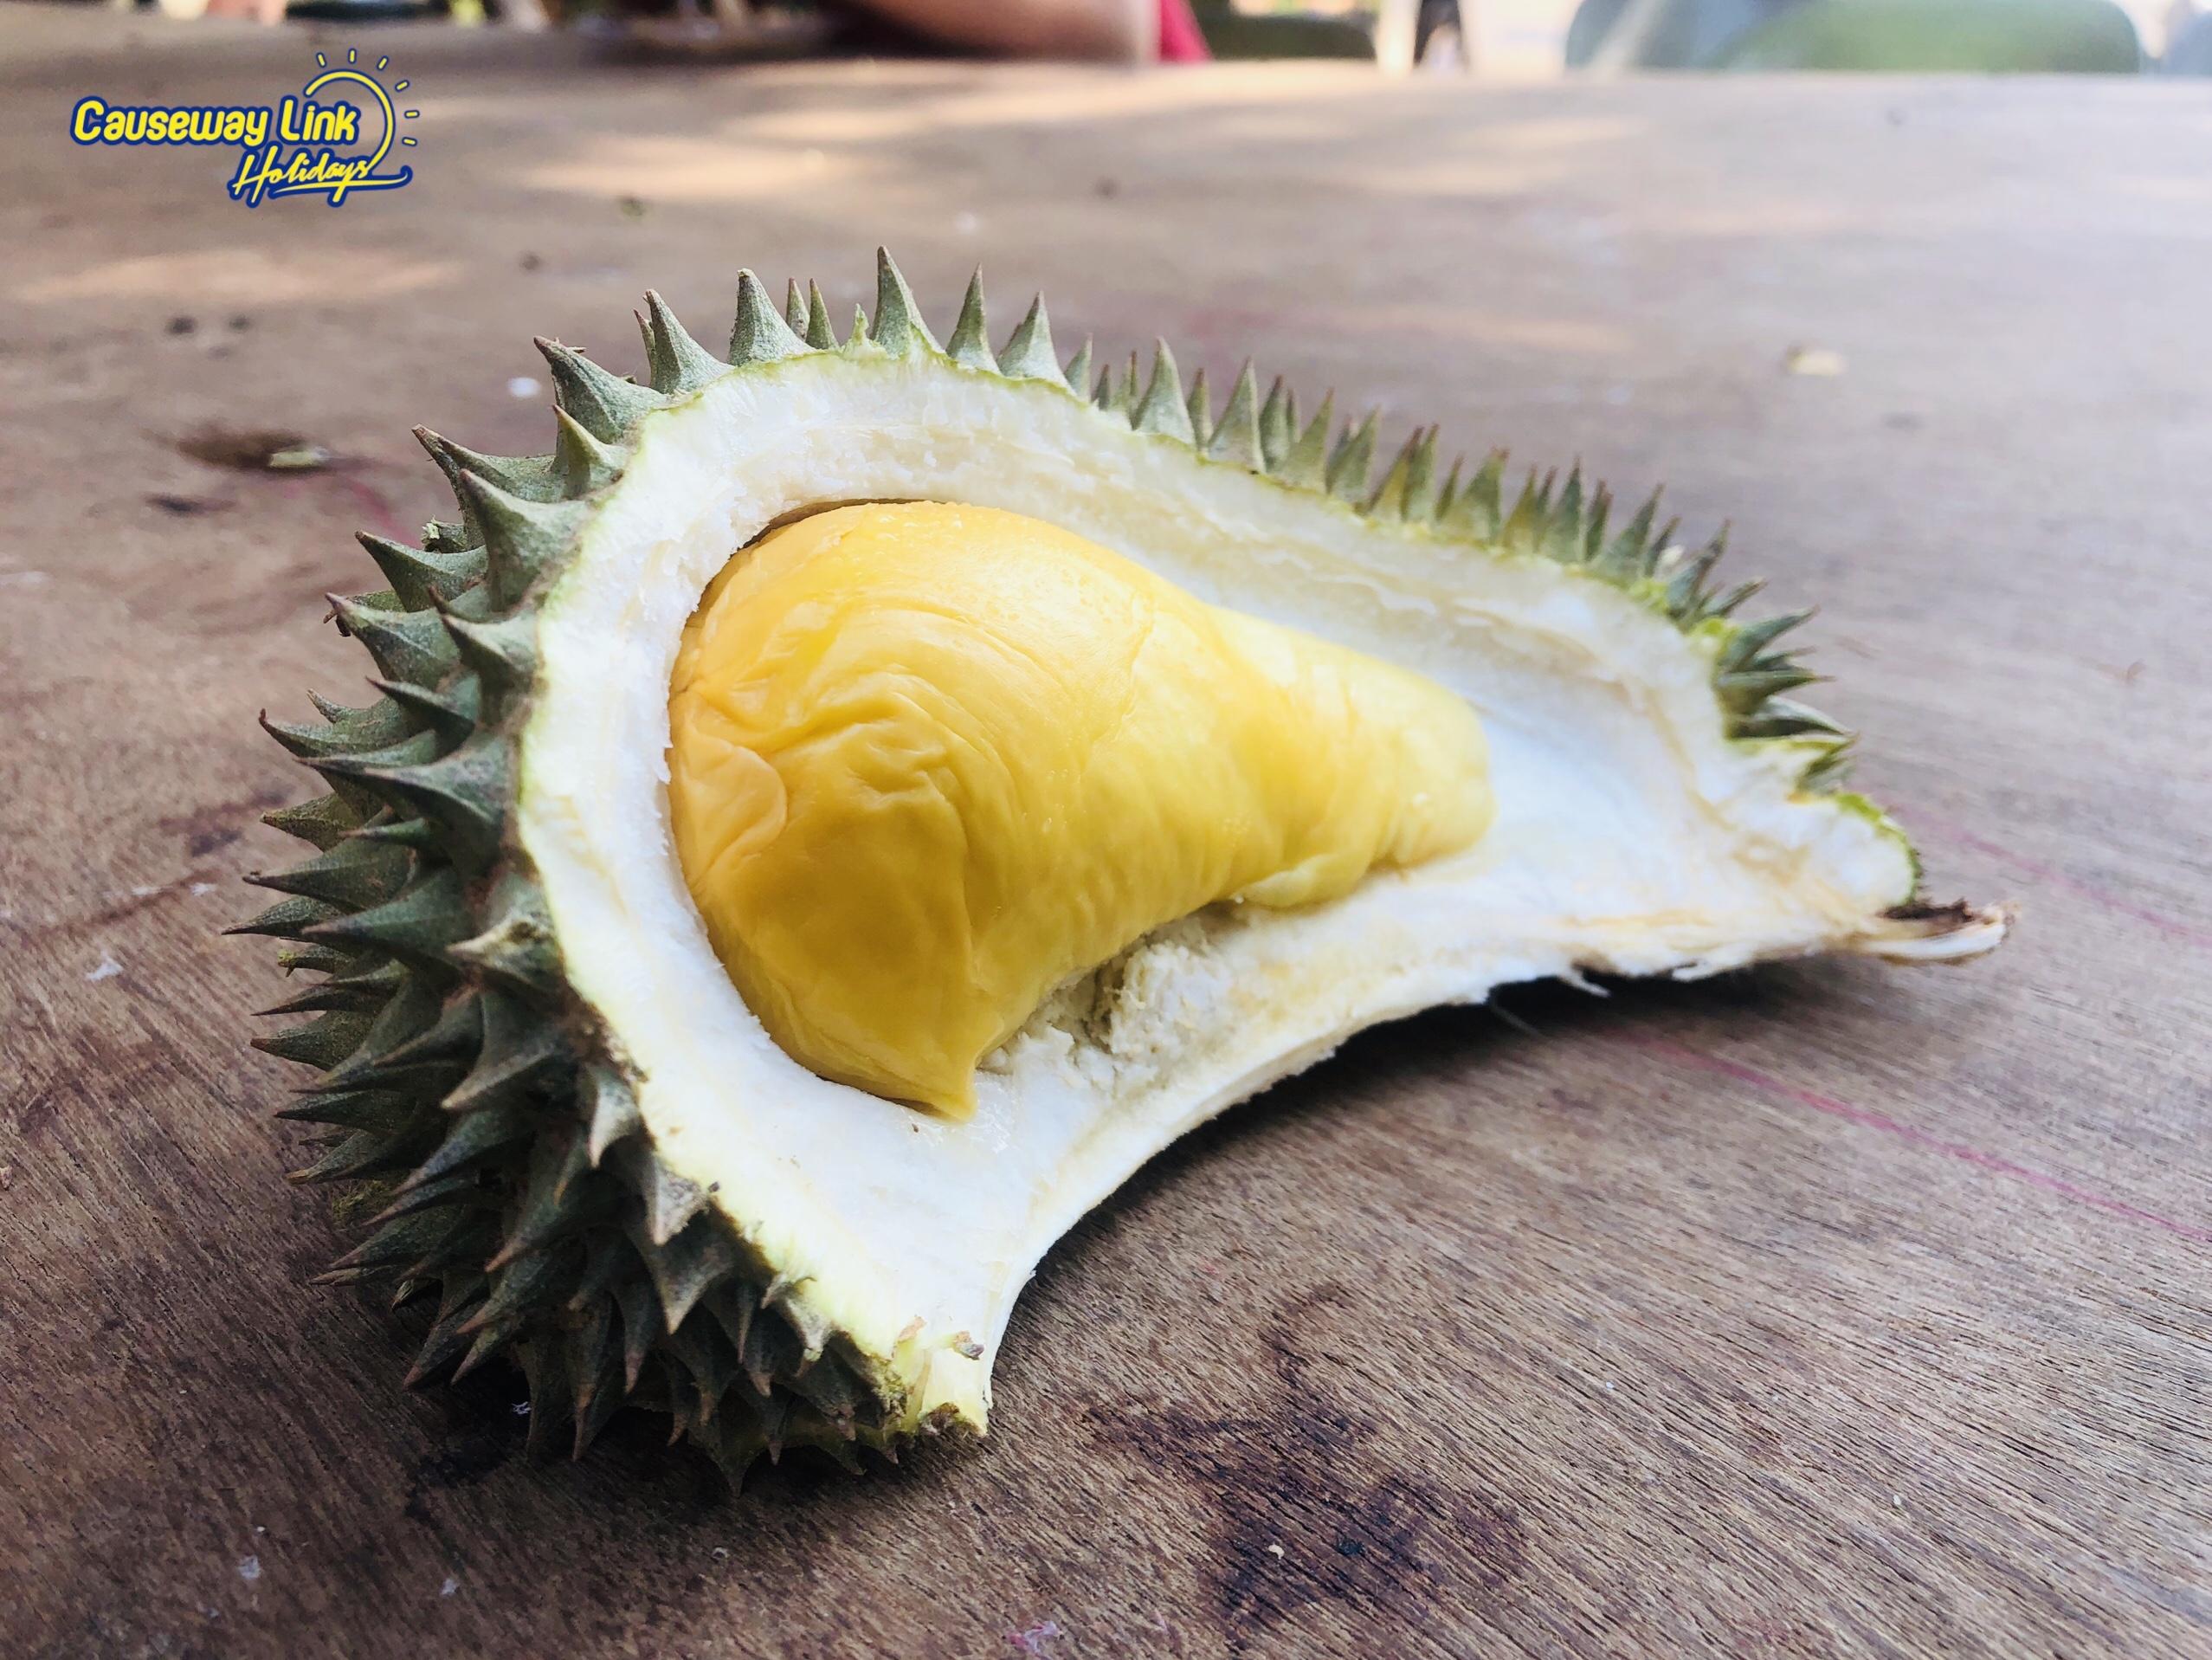 Causeway Link Holidays Durian Trip